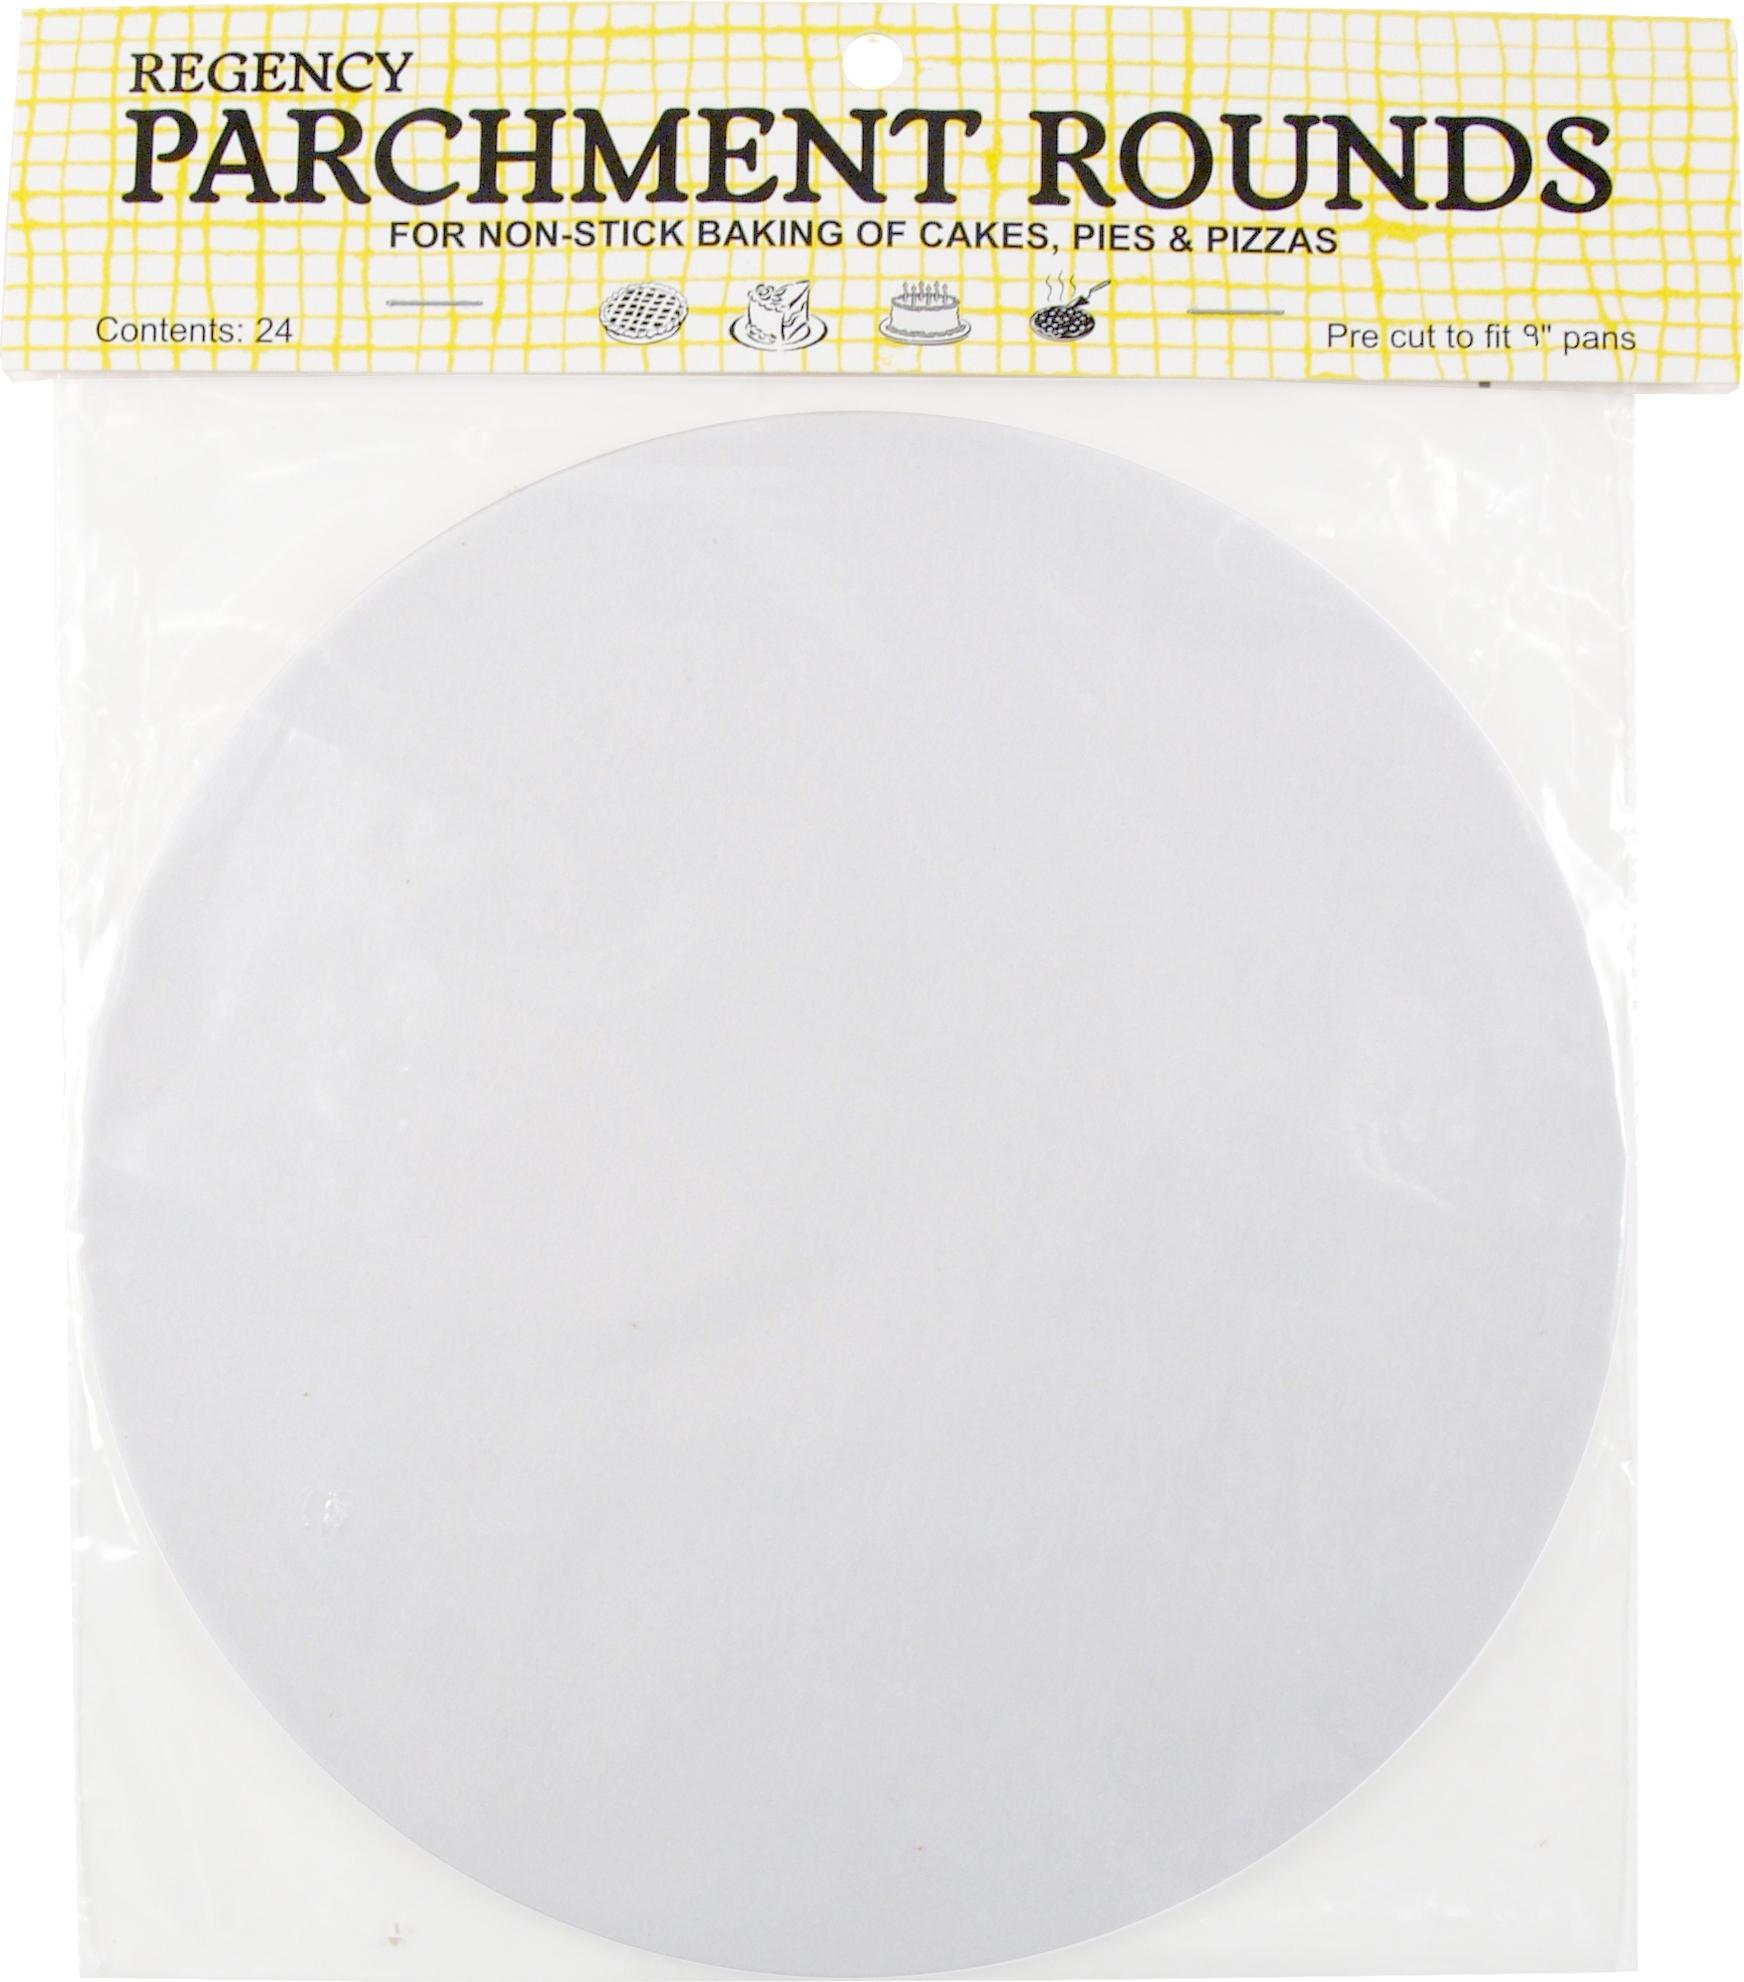 Regency 9 Inch Precut Parchment Round, Set of 24